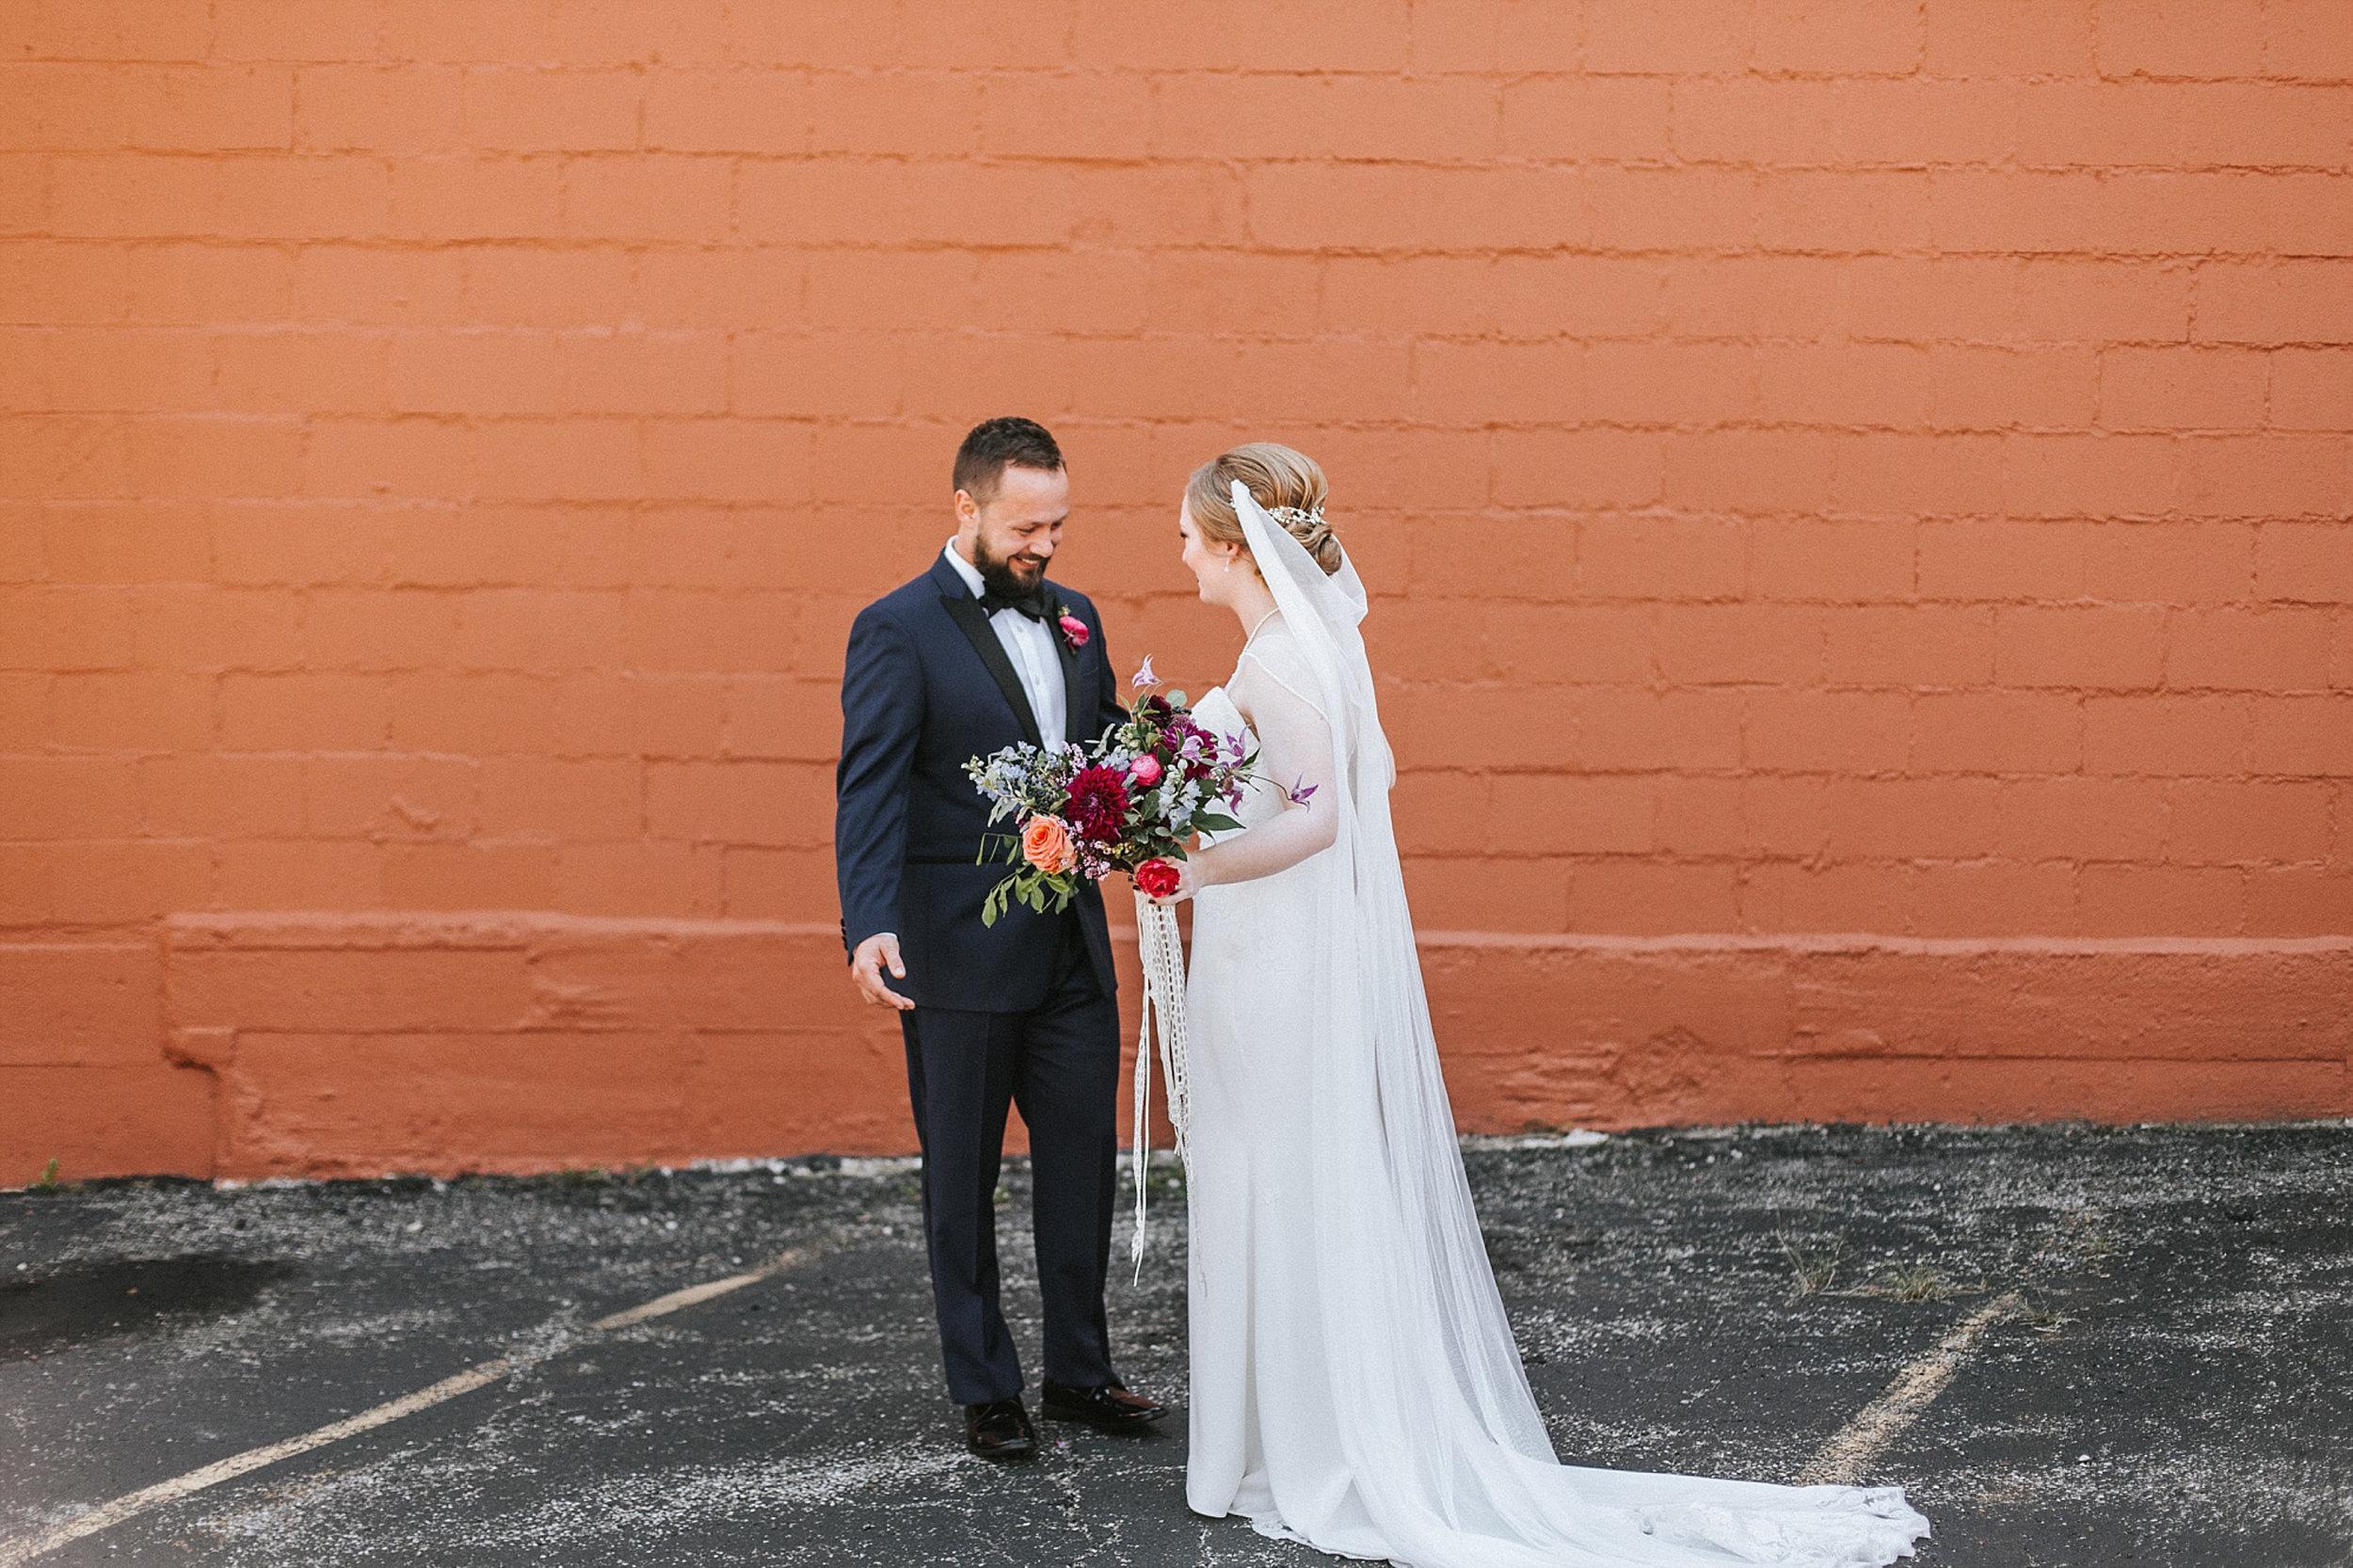 Brooke Townsend Photography - Ohio Wedding Photographer-41.jpg